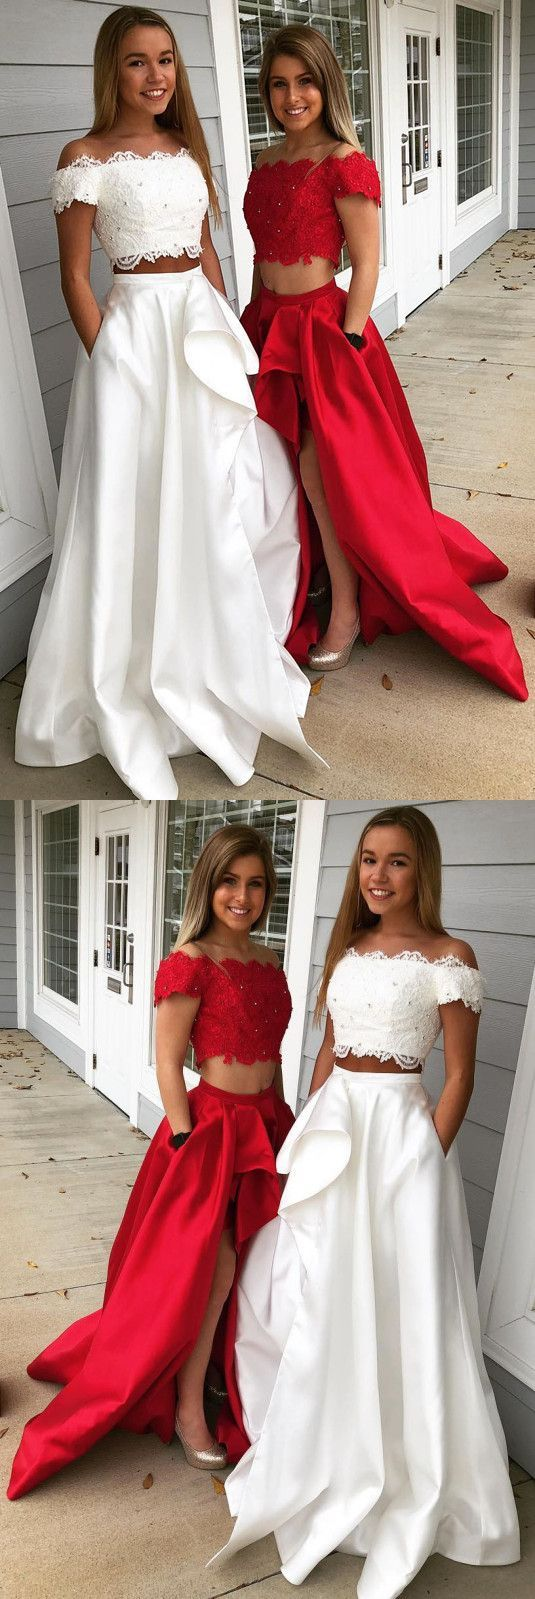 Elegant two pieces off the shoulder prom dresseslong prom dresses